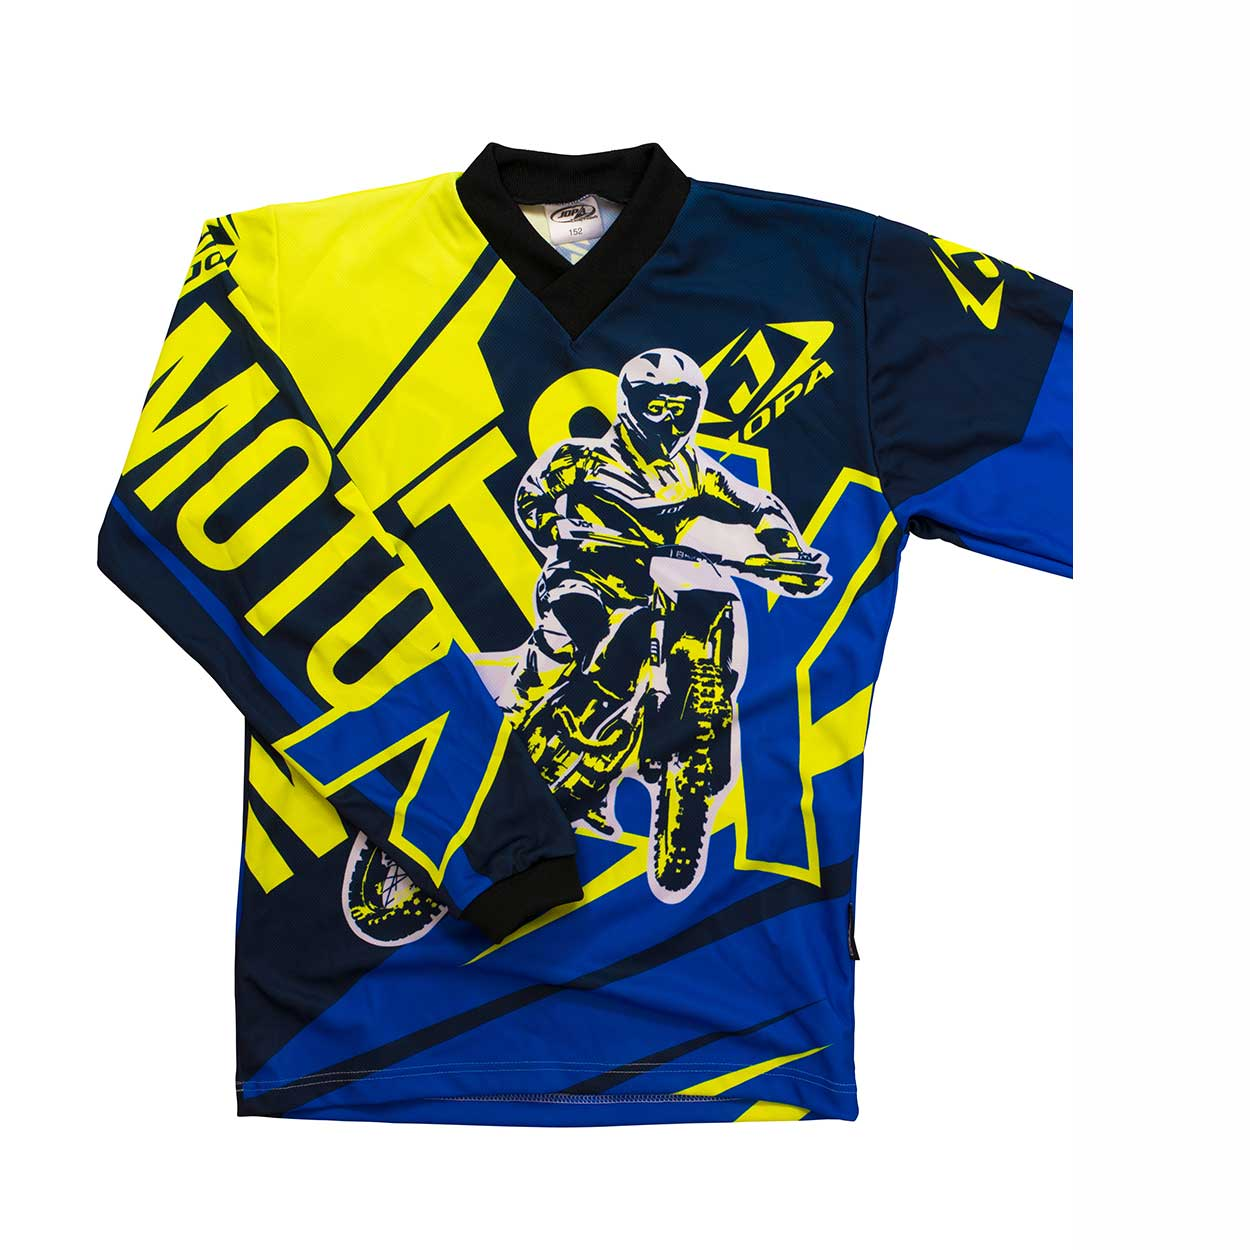 Jopa Kinder Shirt Moto-X Blue/Neon-98